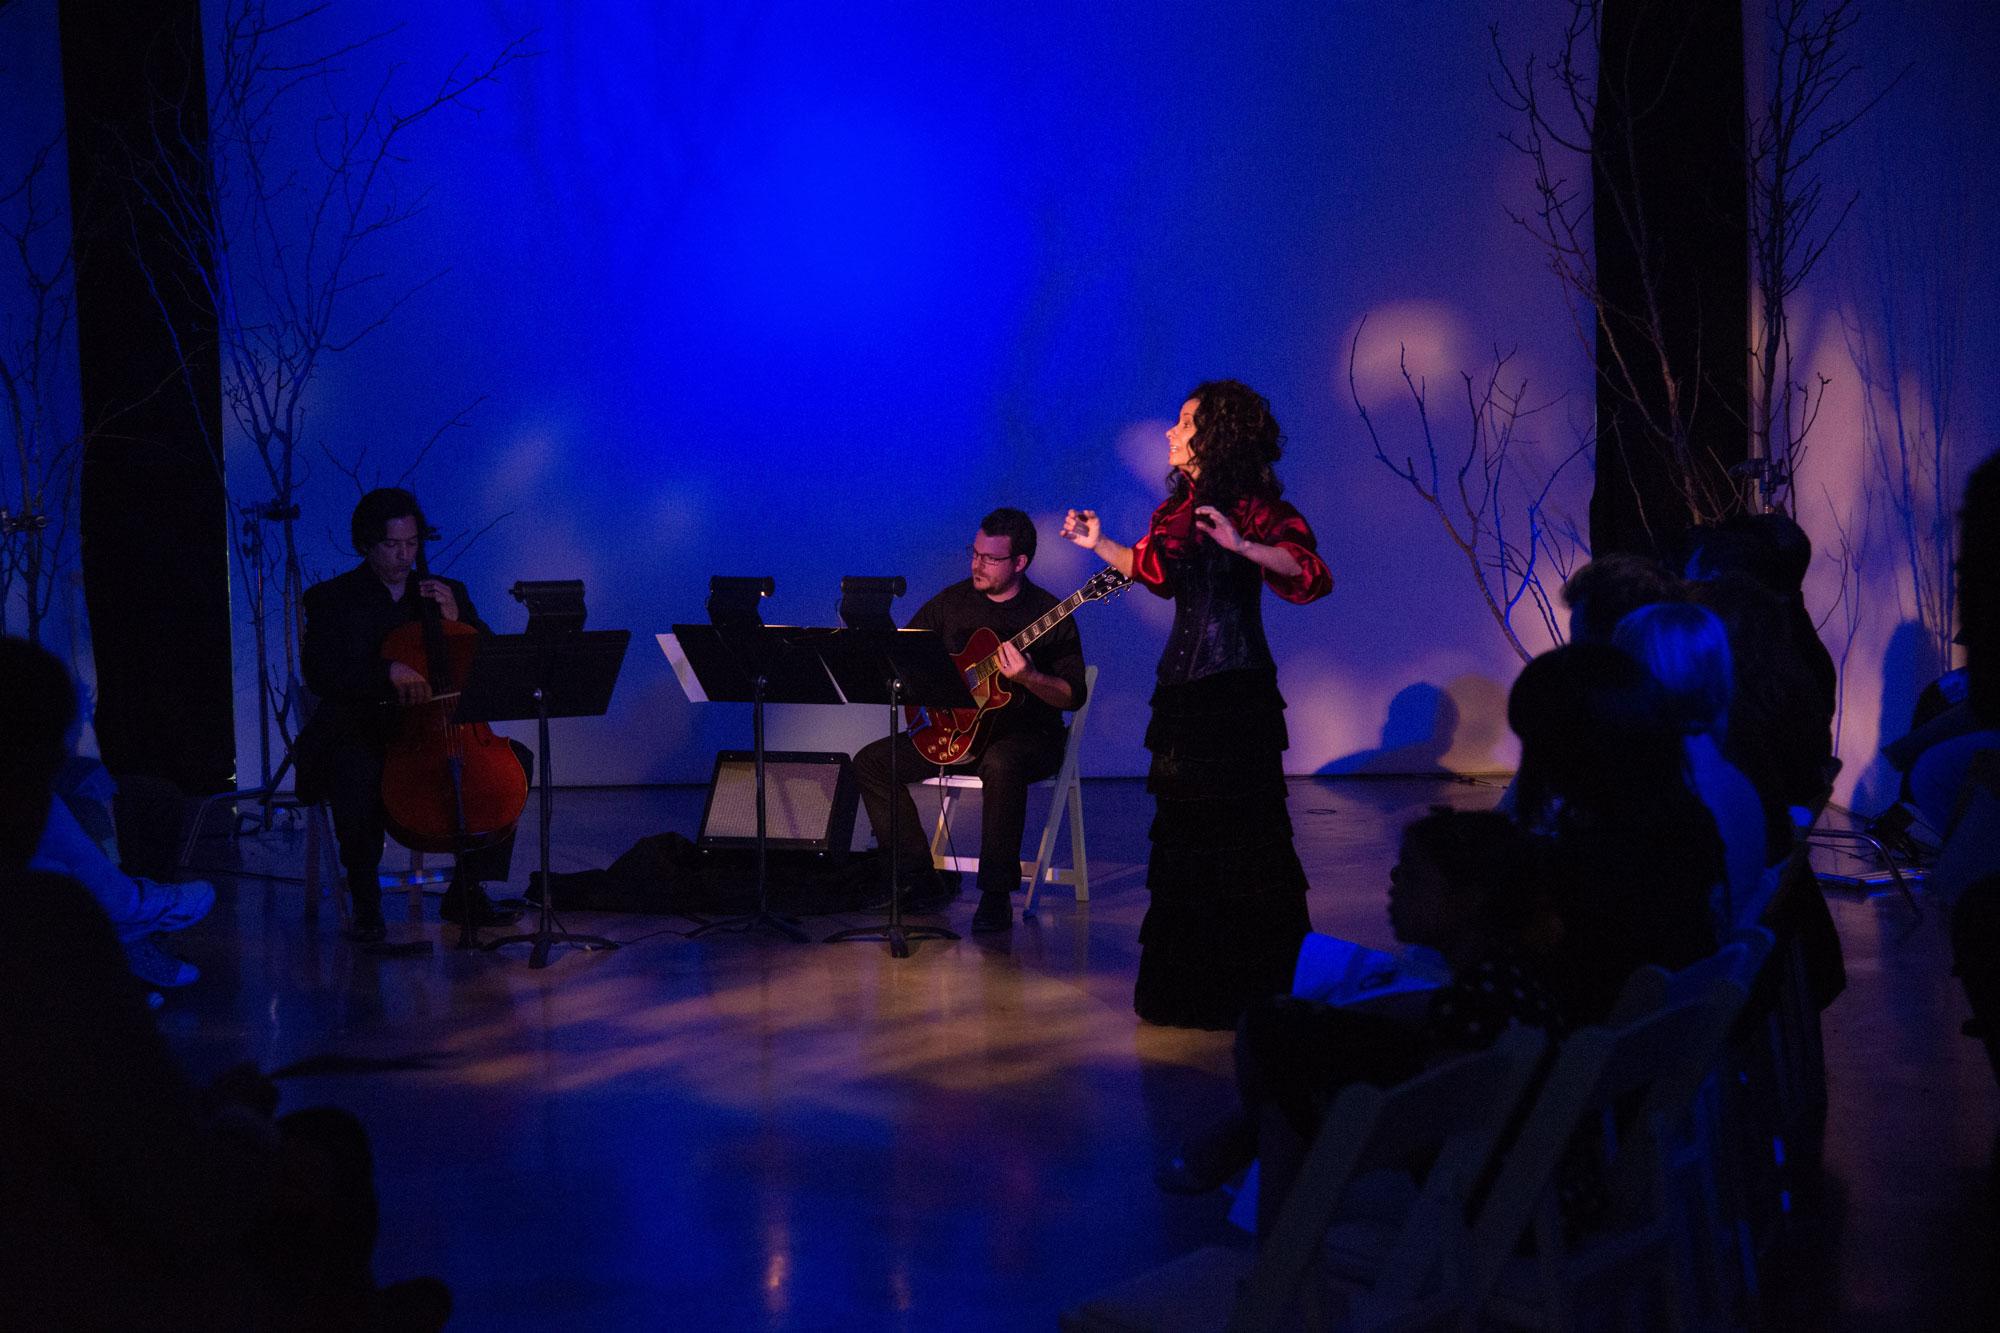 ravens & radishes. Misha Penton, soprano, concept, text. George Heathco, music. Meg Brooker, dancer Daniel Saenz, cello. Photo: David DeHoyos